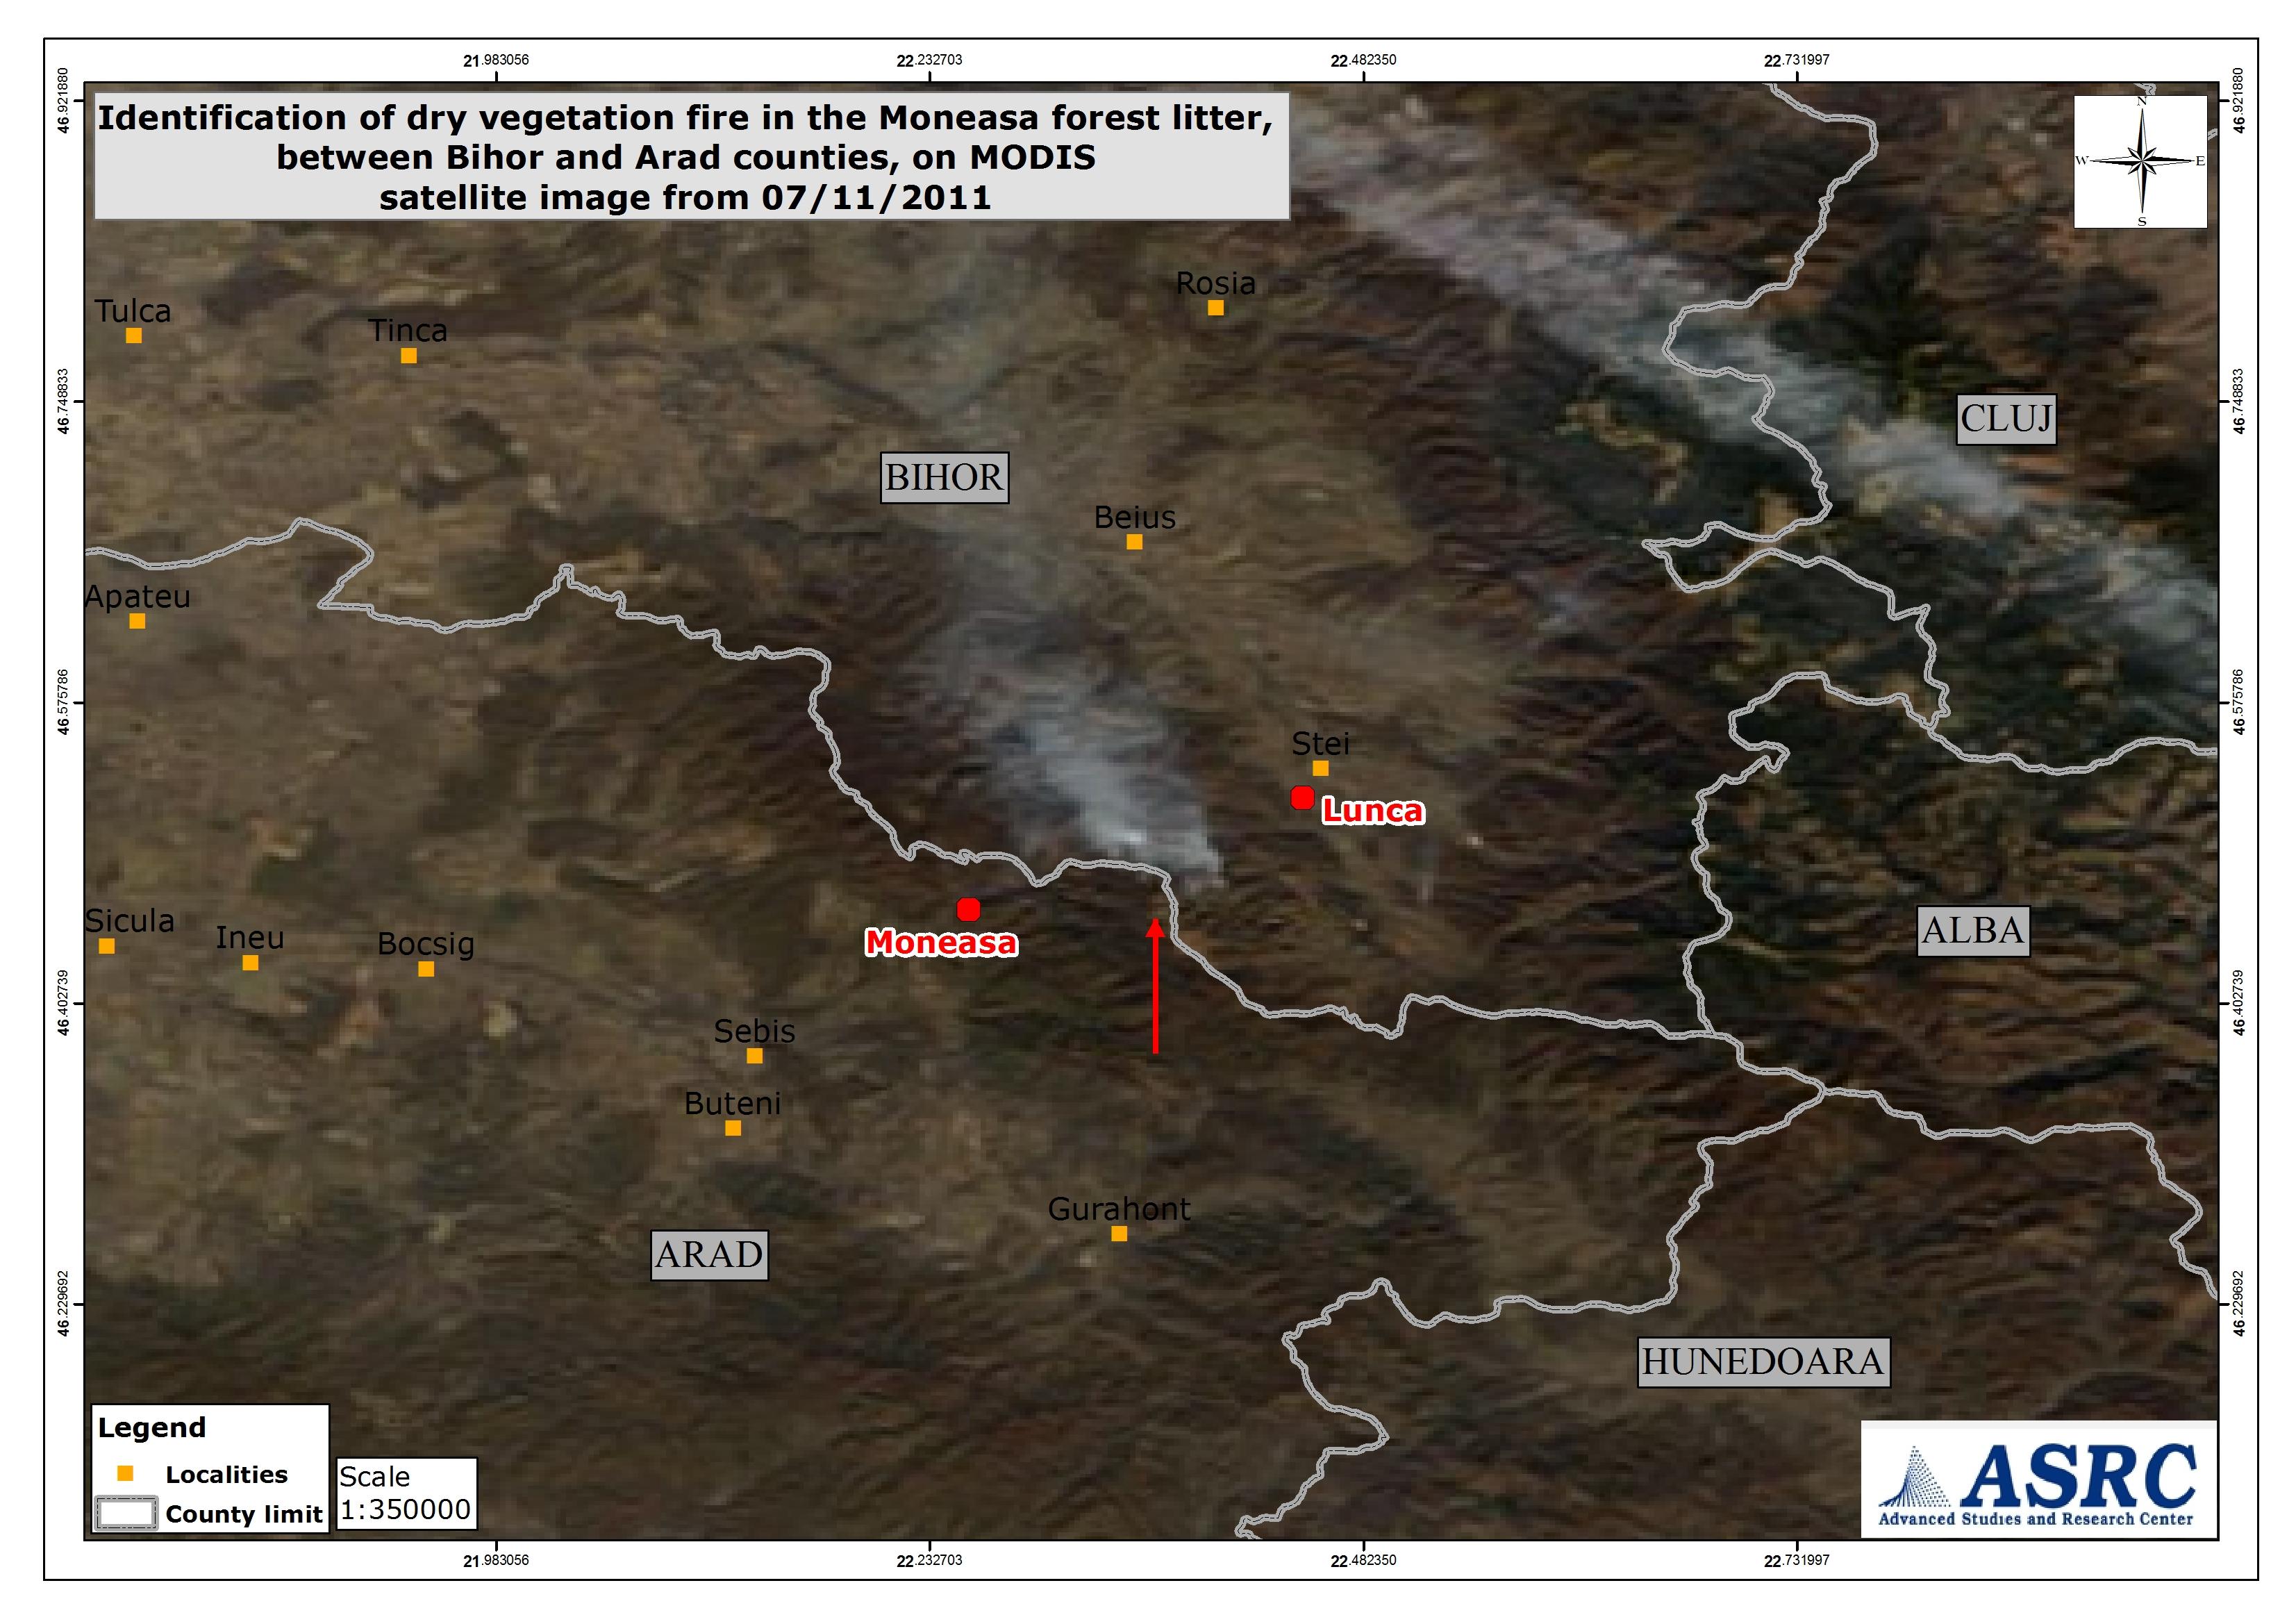 Satellite Wildfire Identification In Moneasa Forest Bihor County Jpg